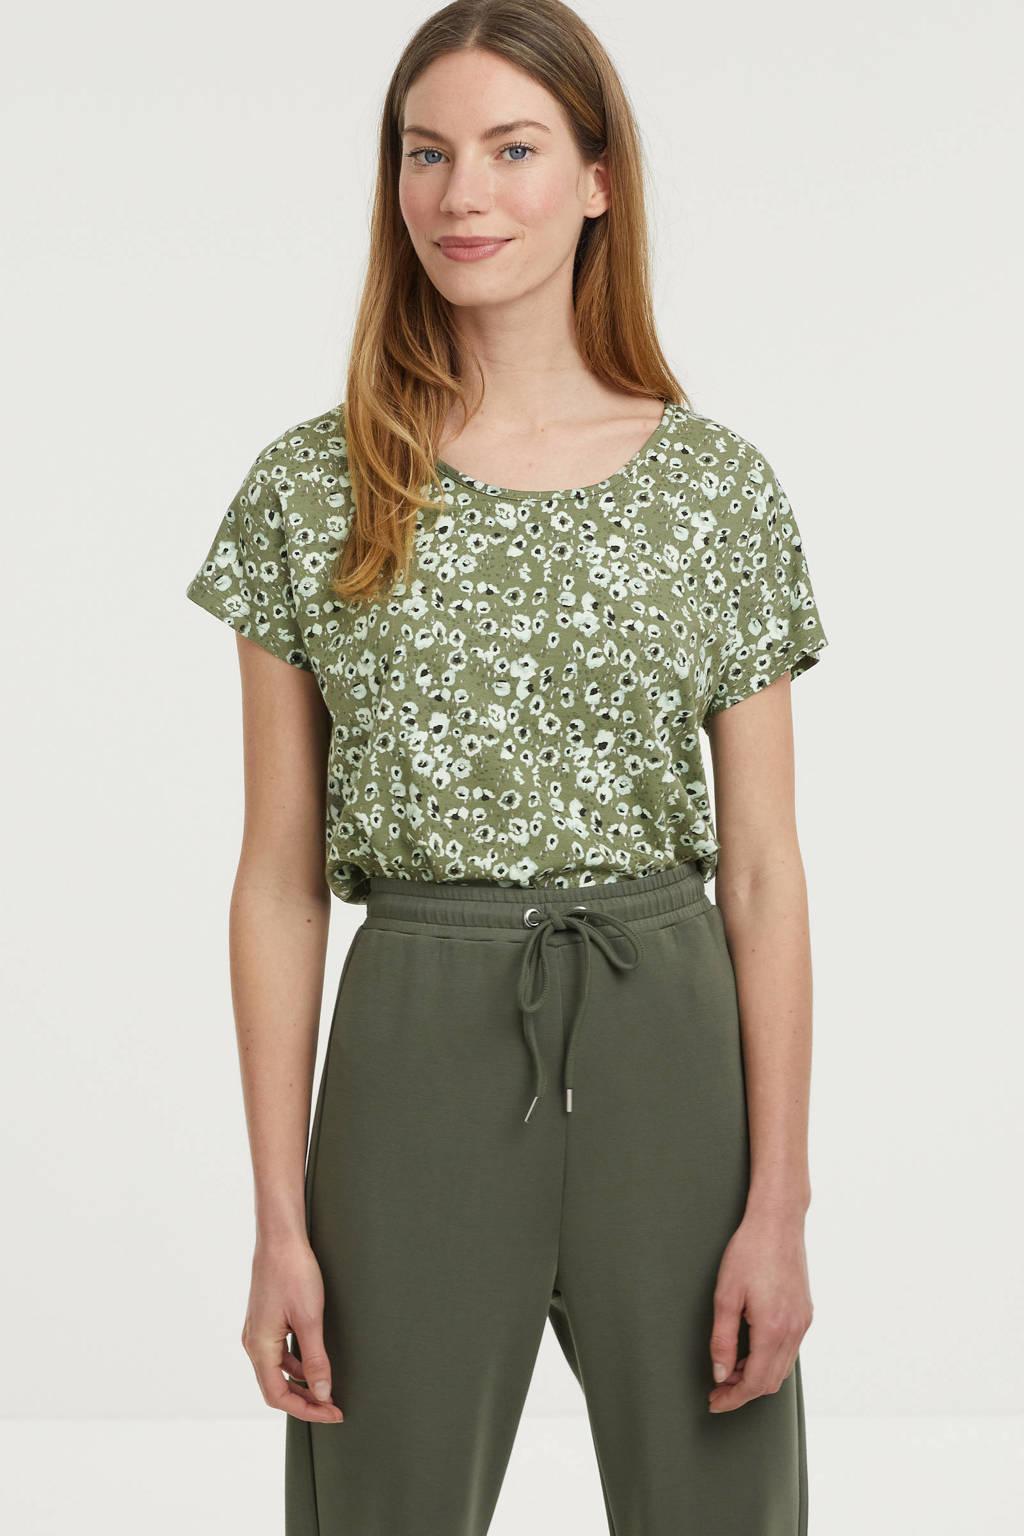 Fransa gebloemd T-shirt olijfgroen/lichtblauw/zwart, Olijfgroen/lichtblauw/zwart